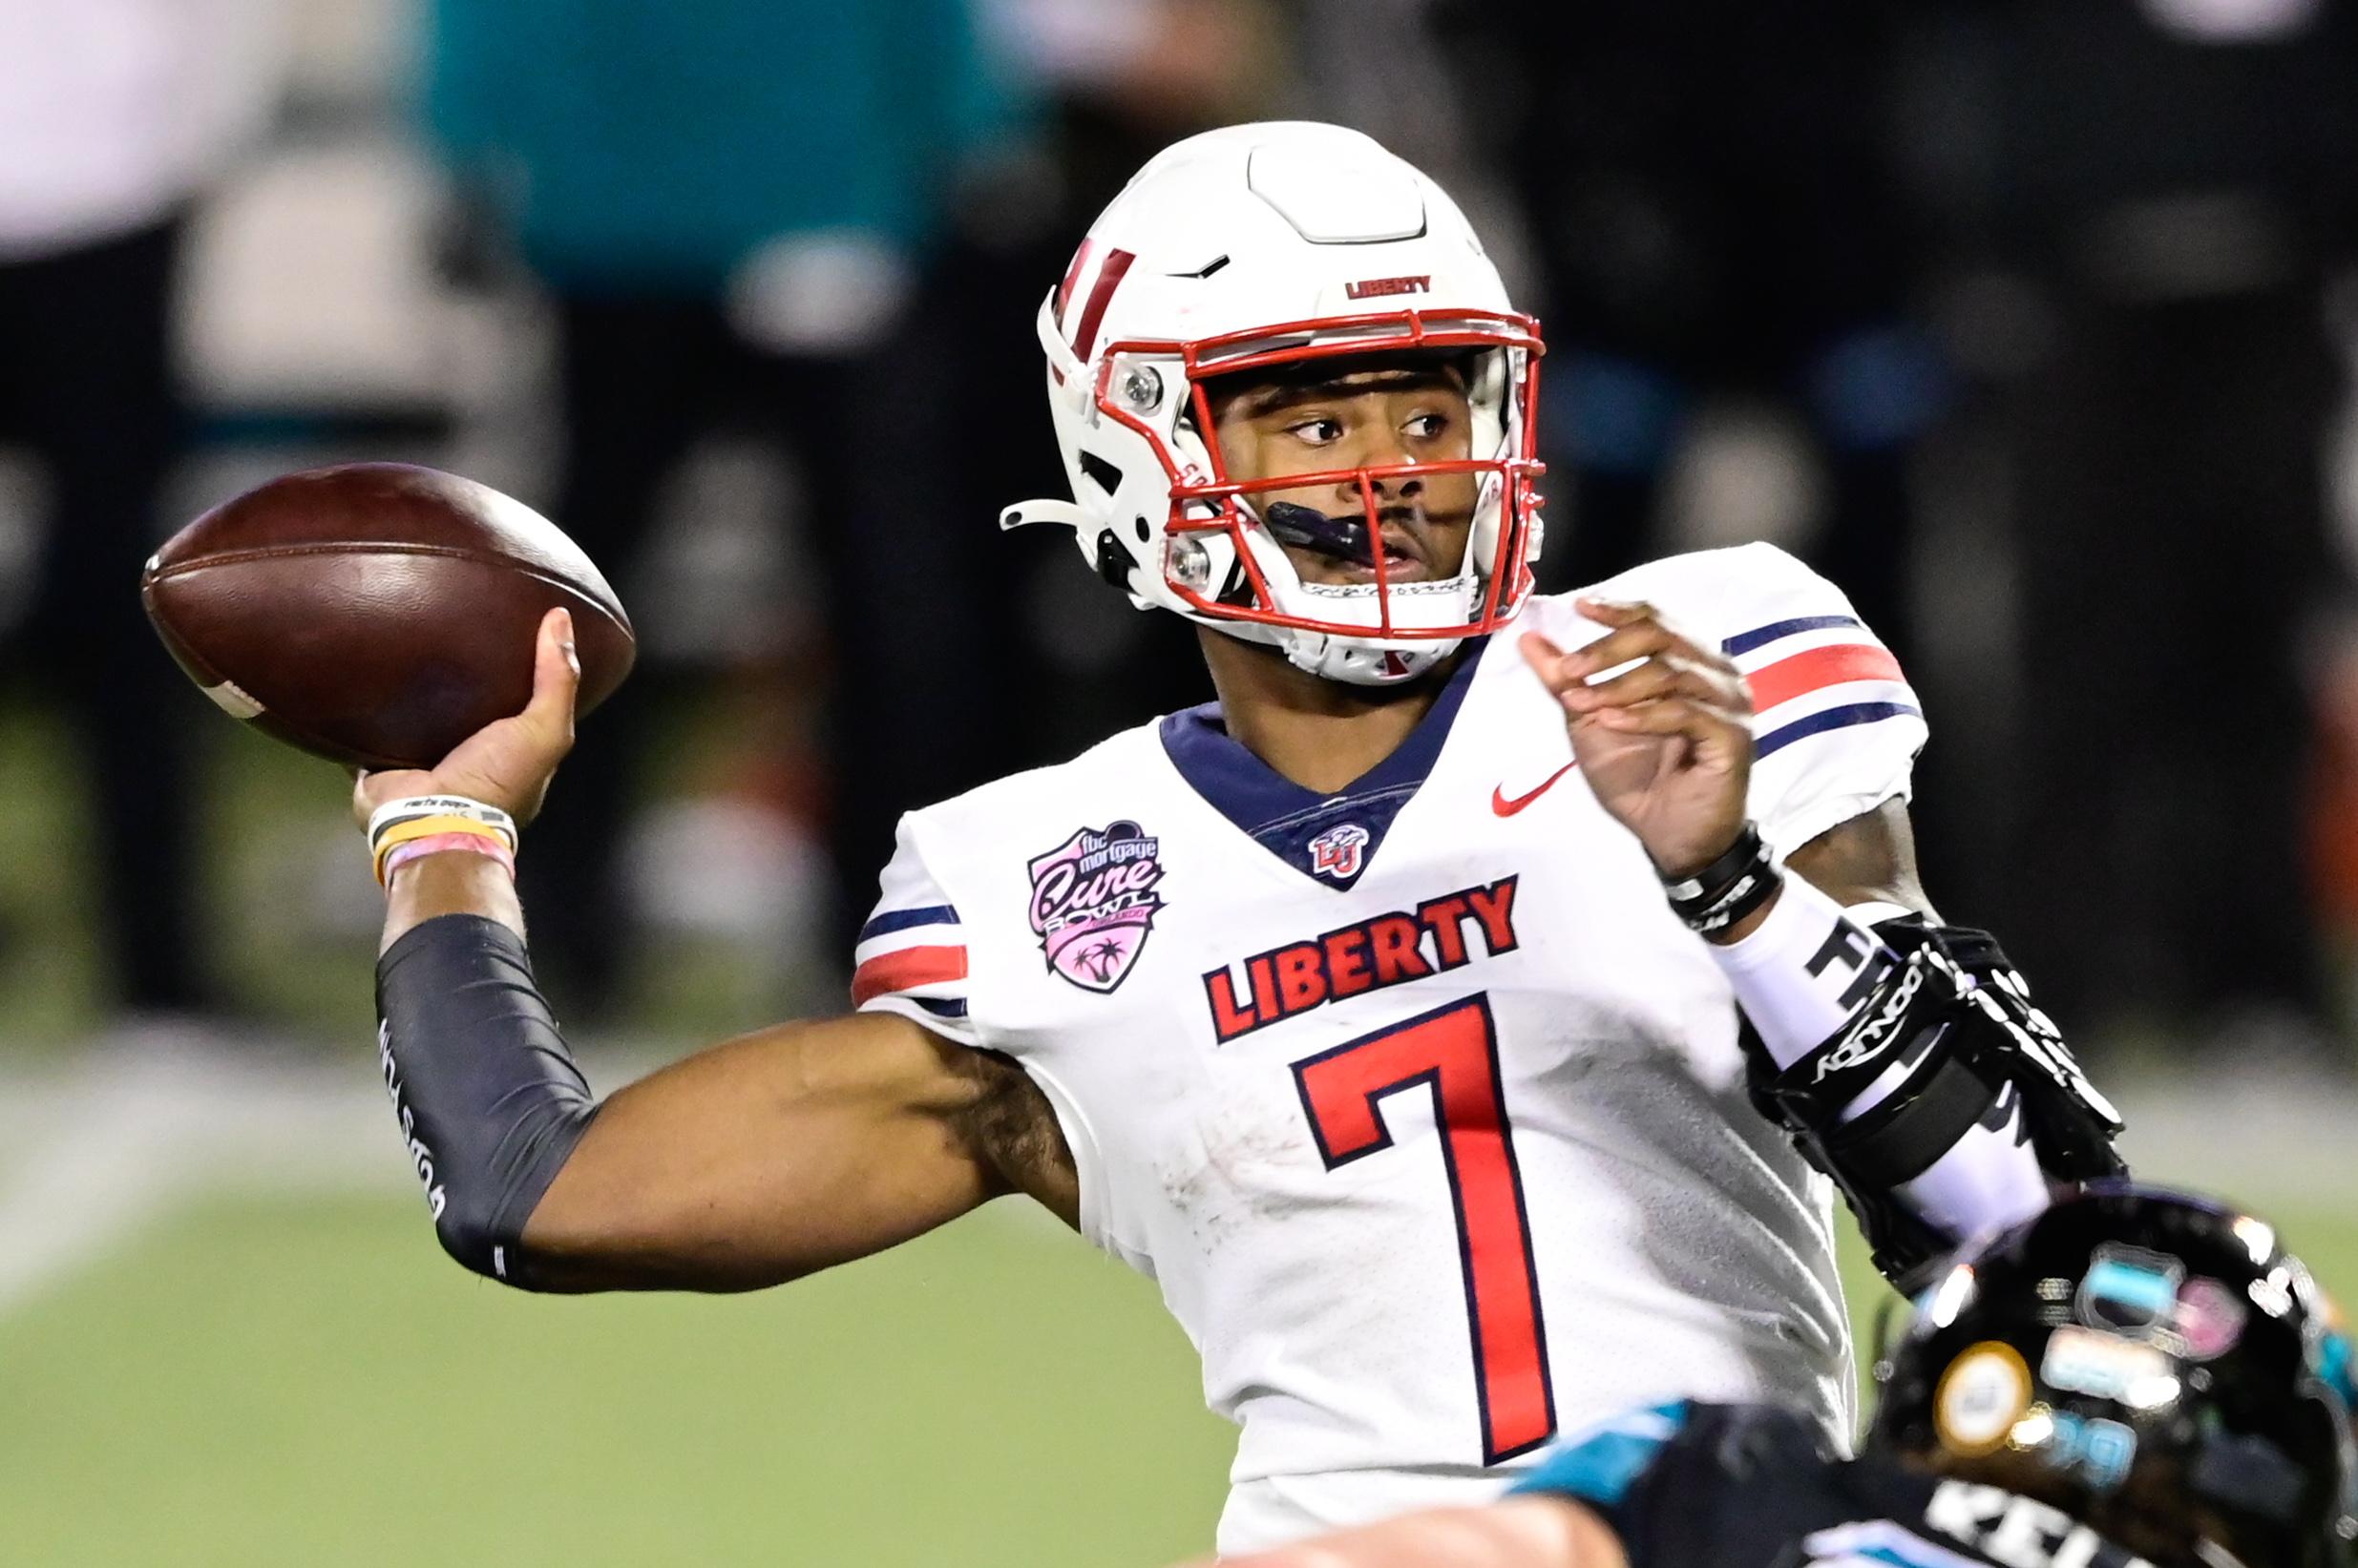 NCAA橄榄球赛:Cure Bowl-Liberty vs Coastal Carolina